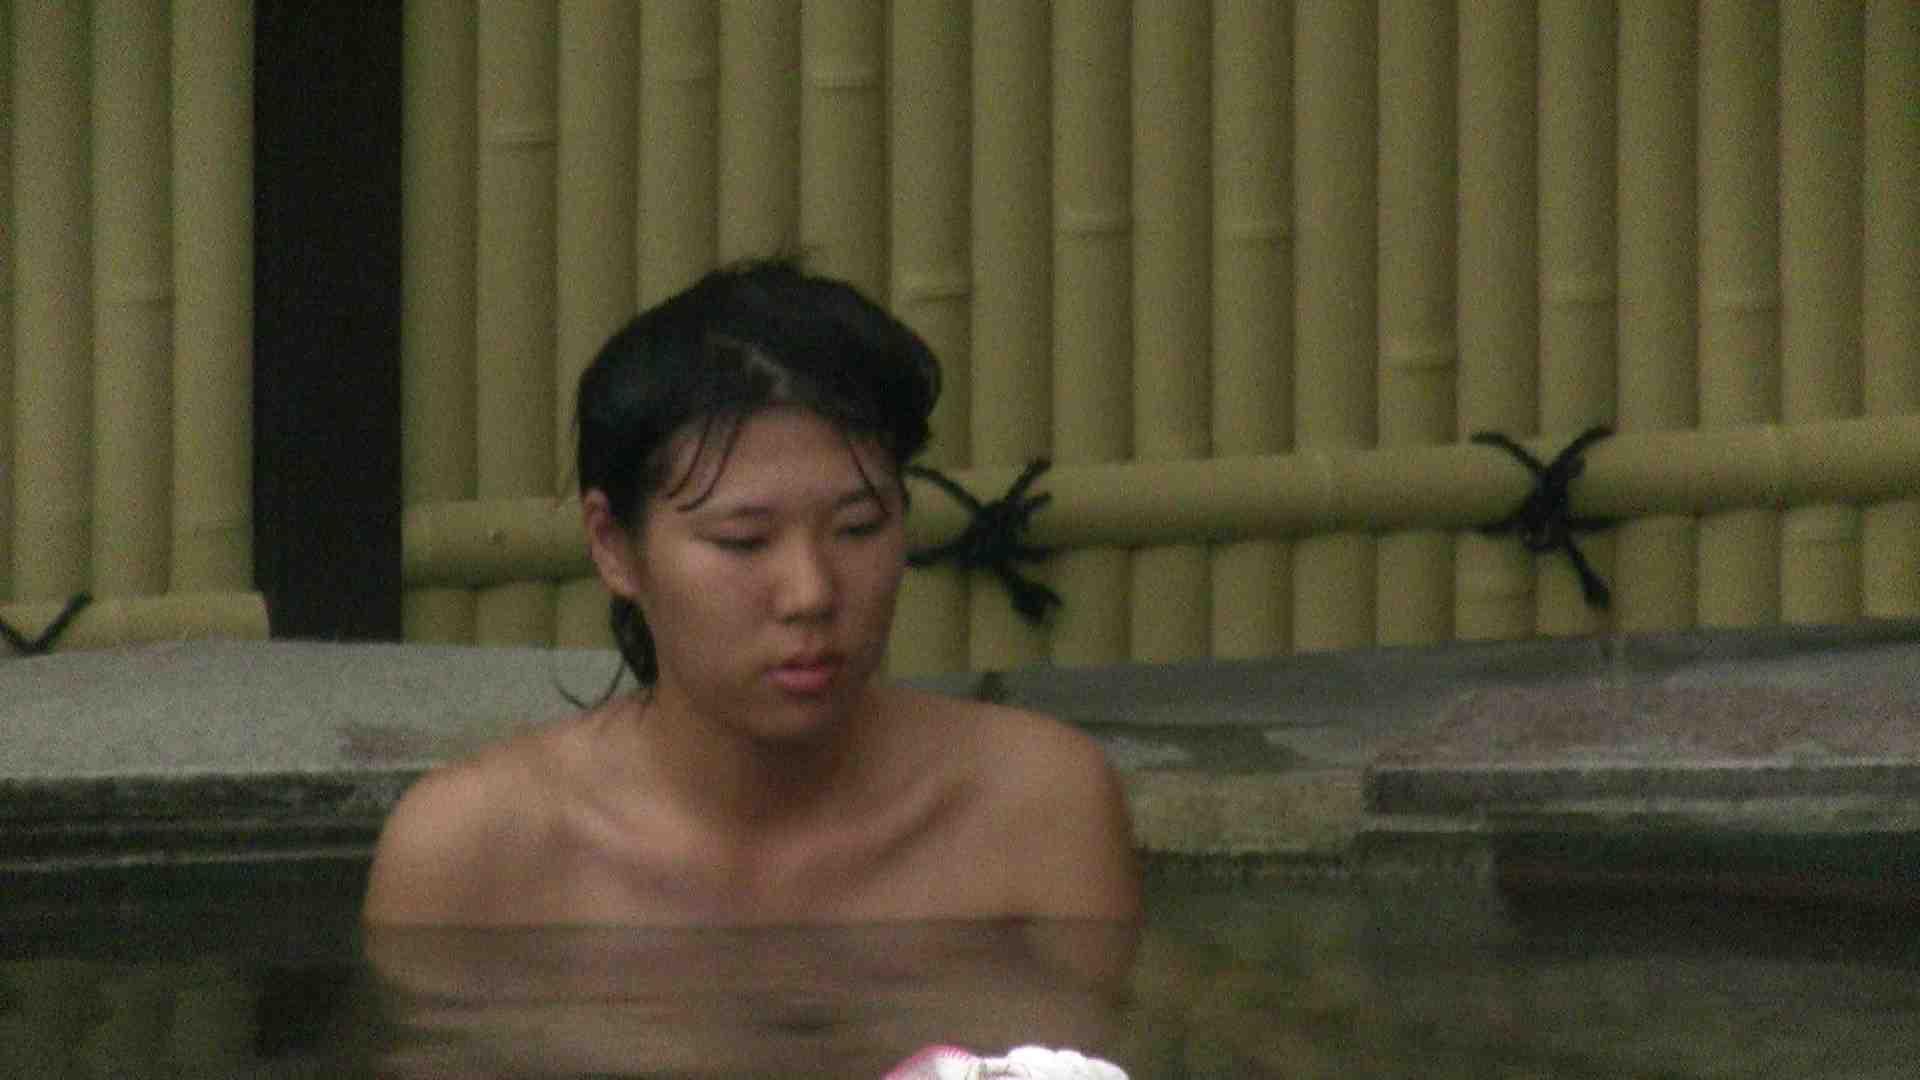 Aquaな露天風呂Vol.215 露天 | OL女体  74連発 16